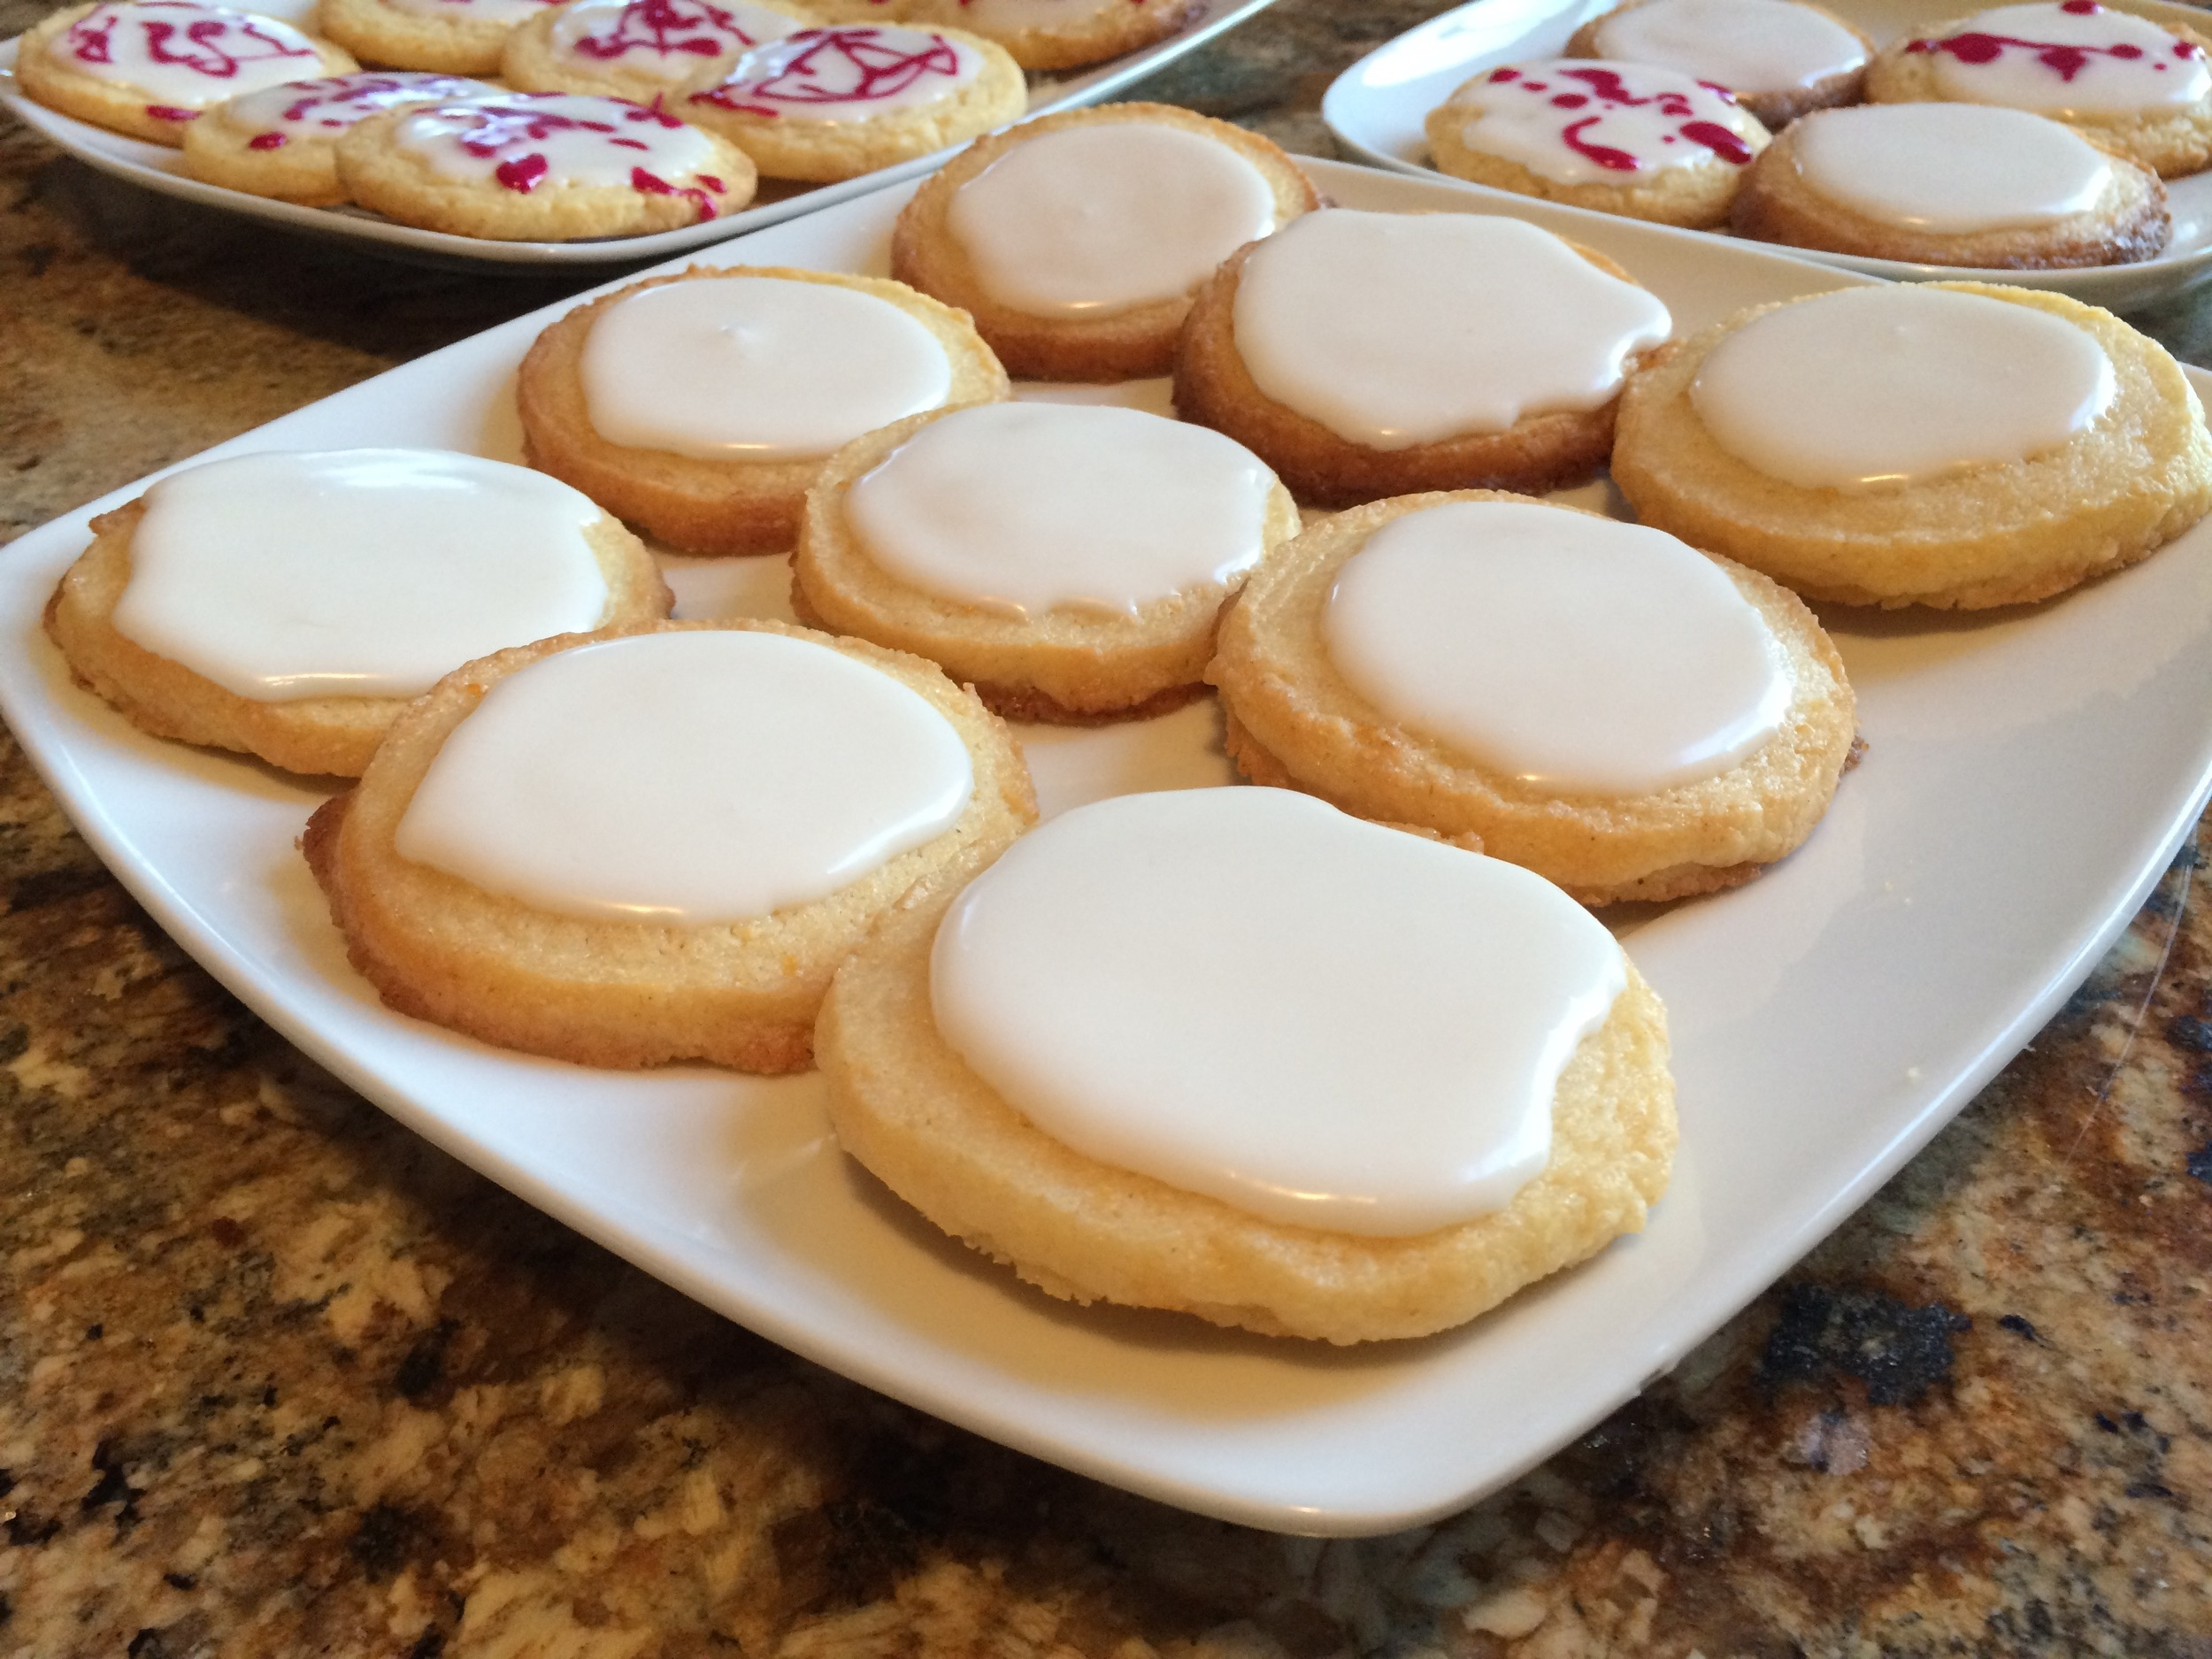 Lemon icebox cookies with glazing